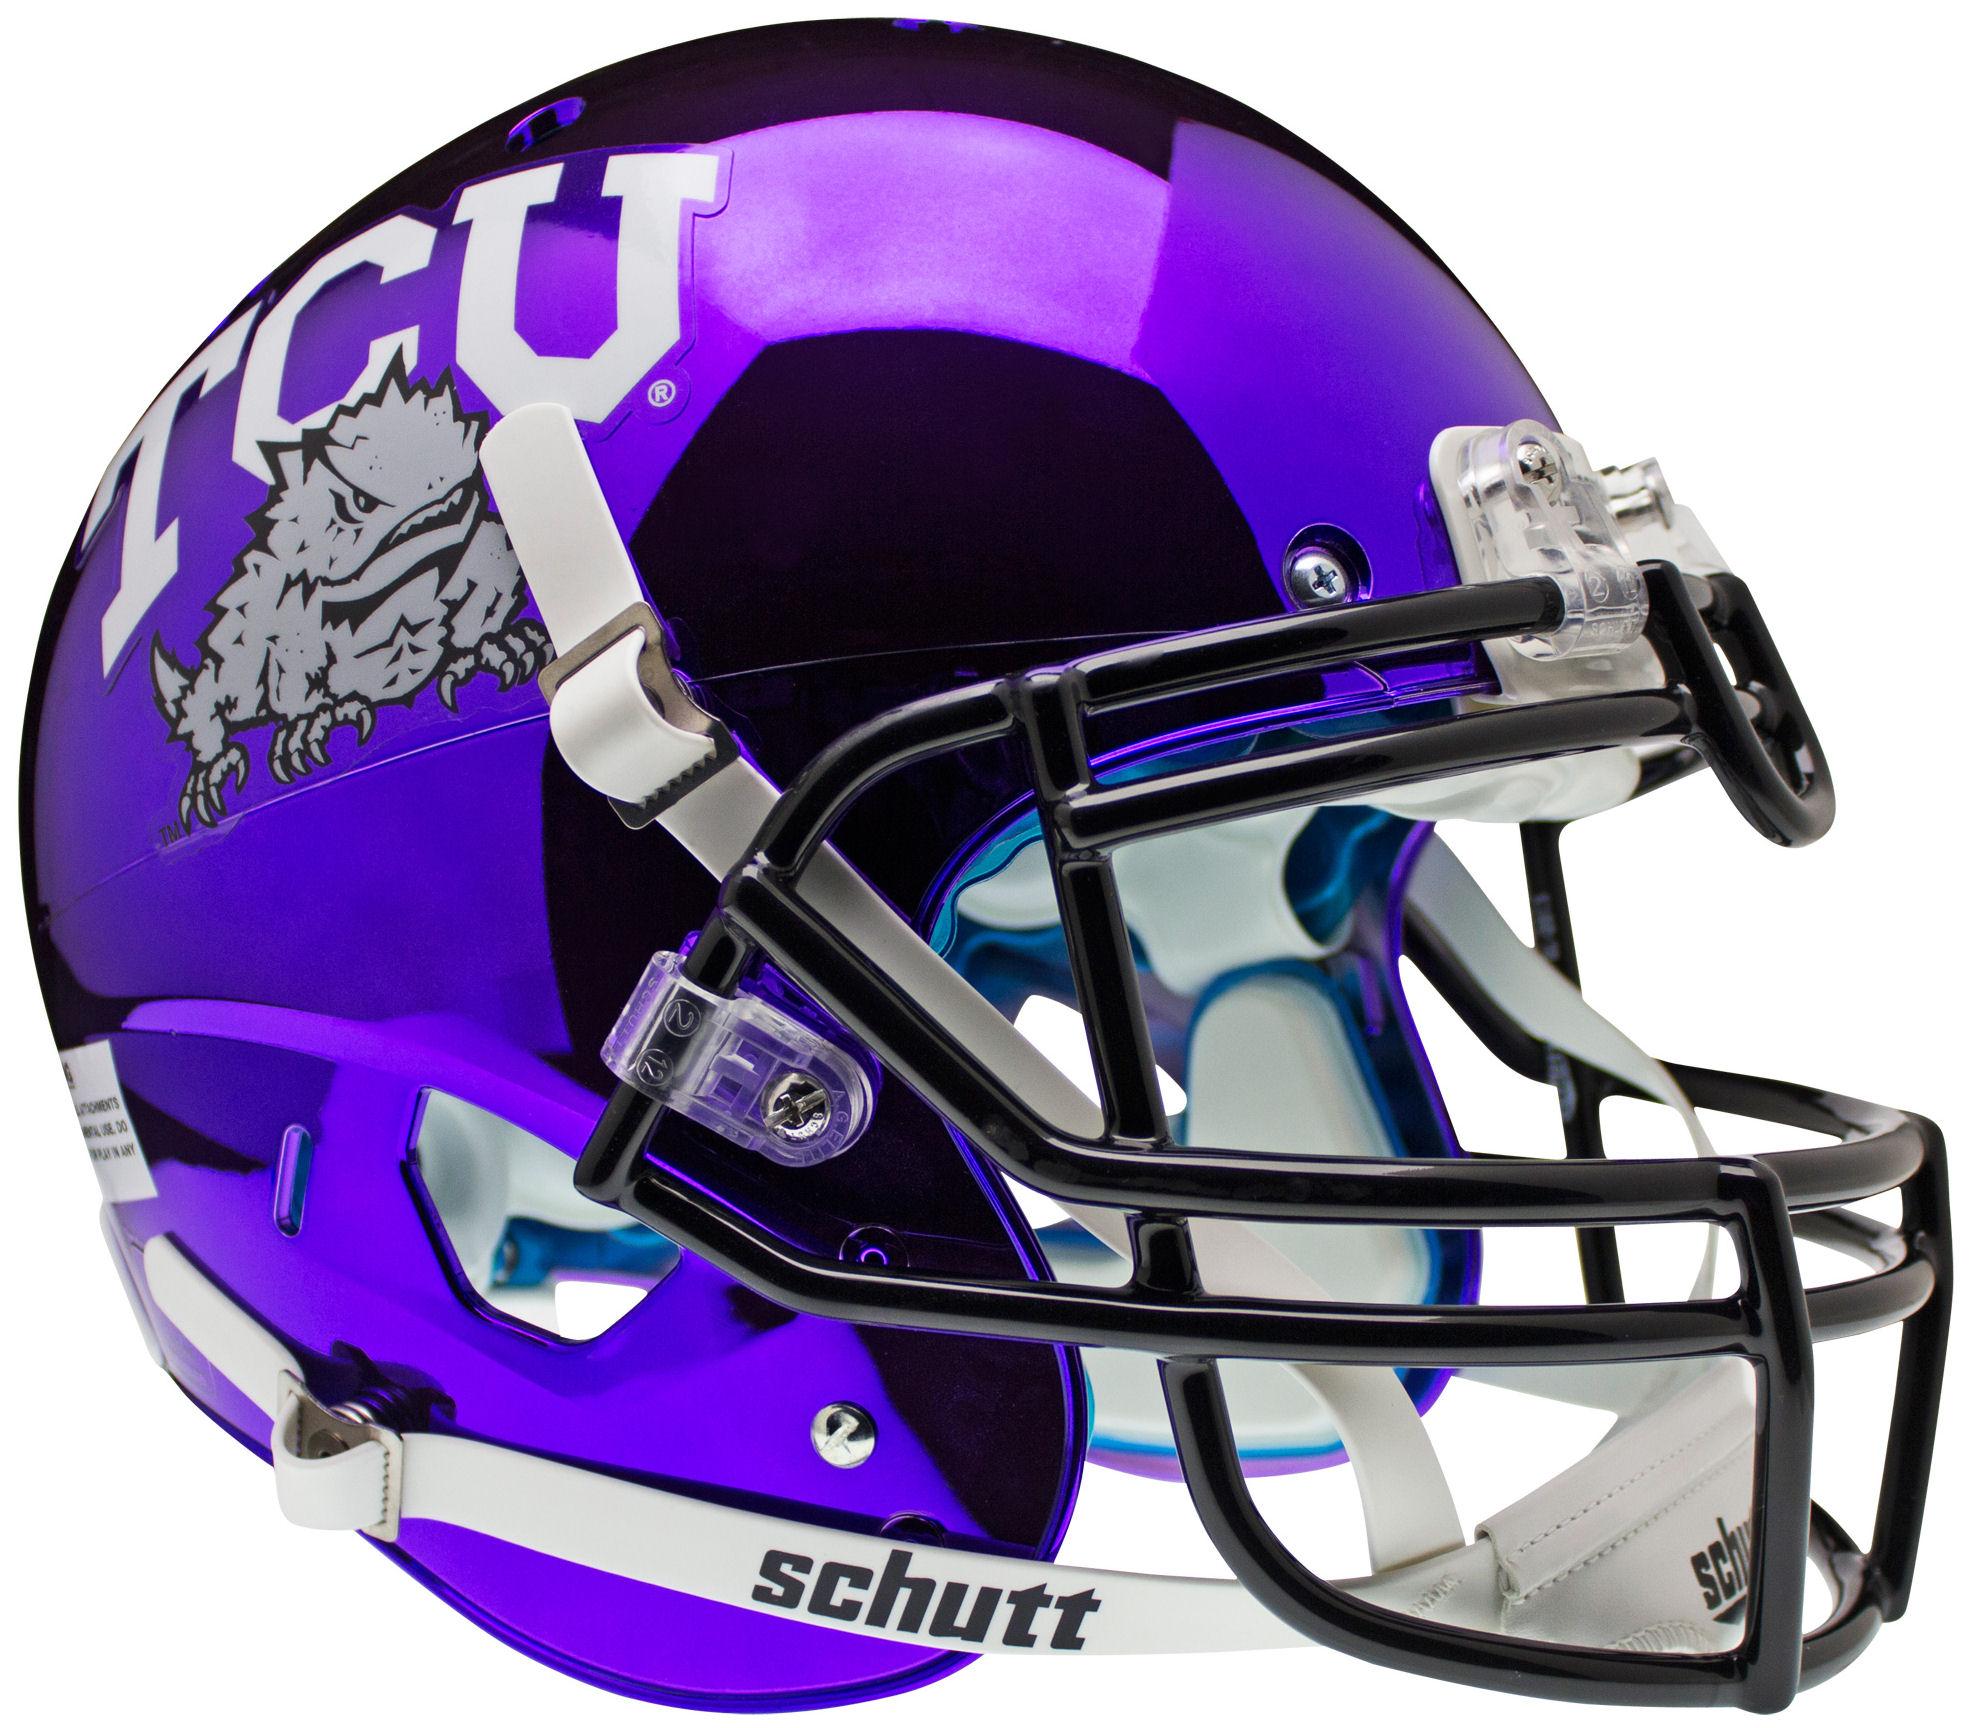 TCU Horned Frogs Authentic College XP Football Helmet Schutt <B>Chrome</B>